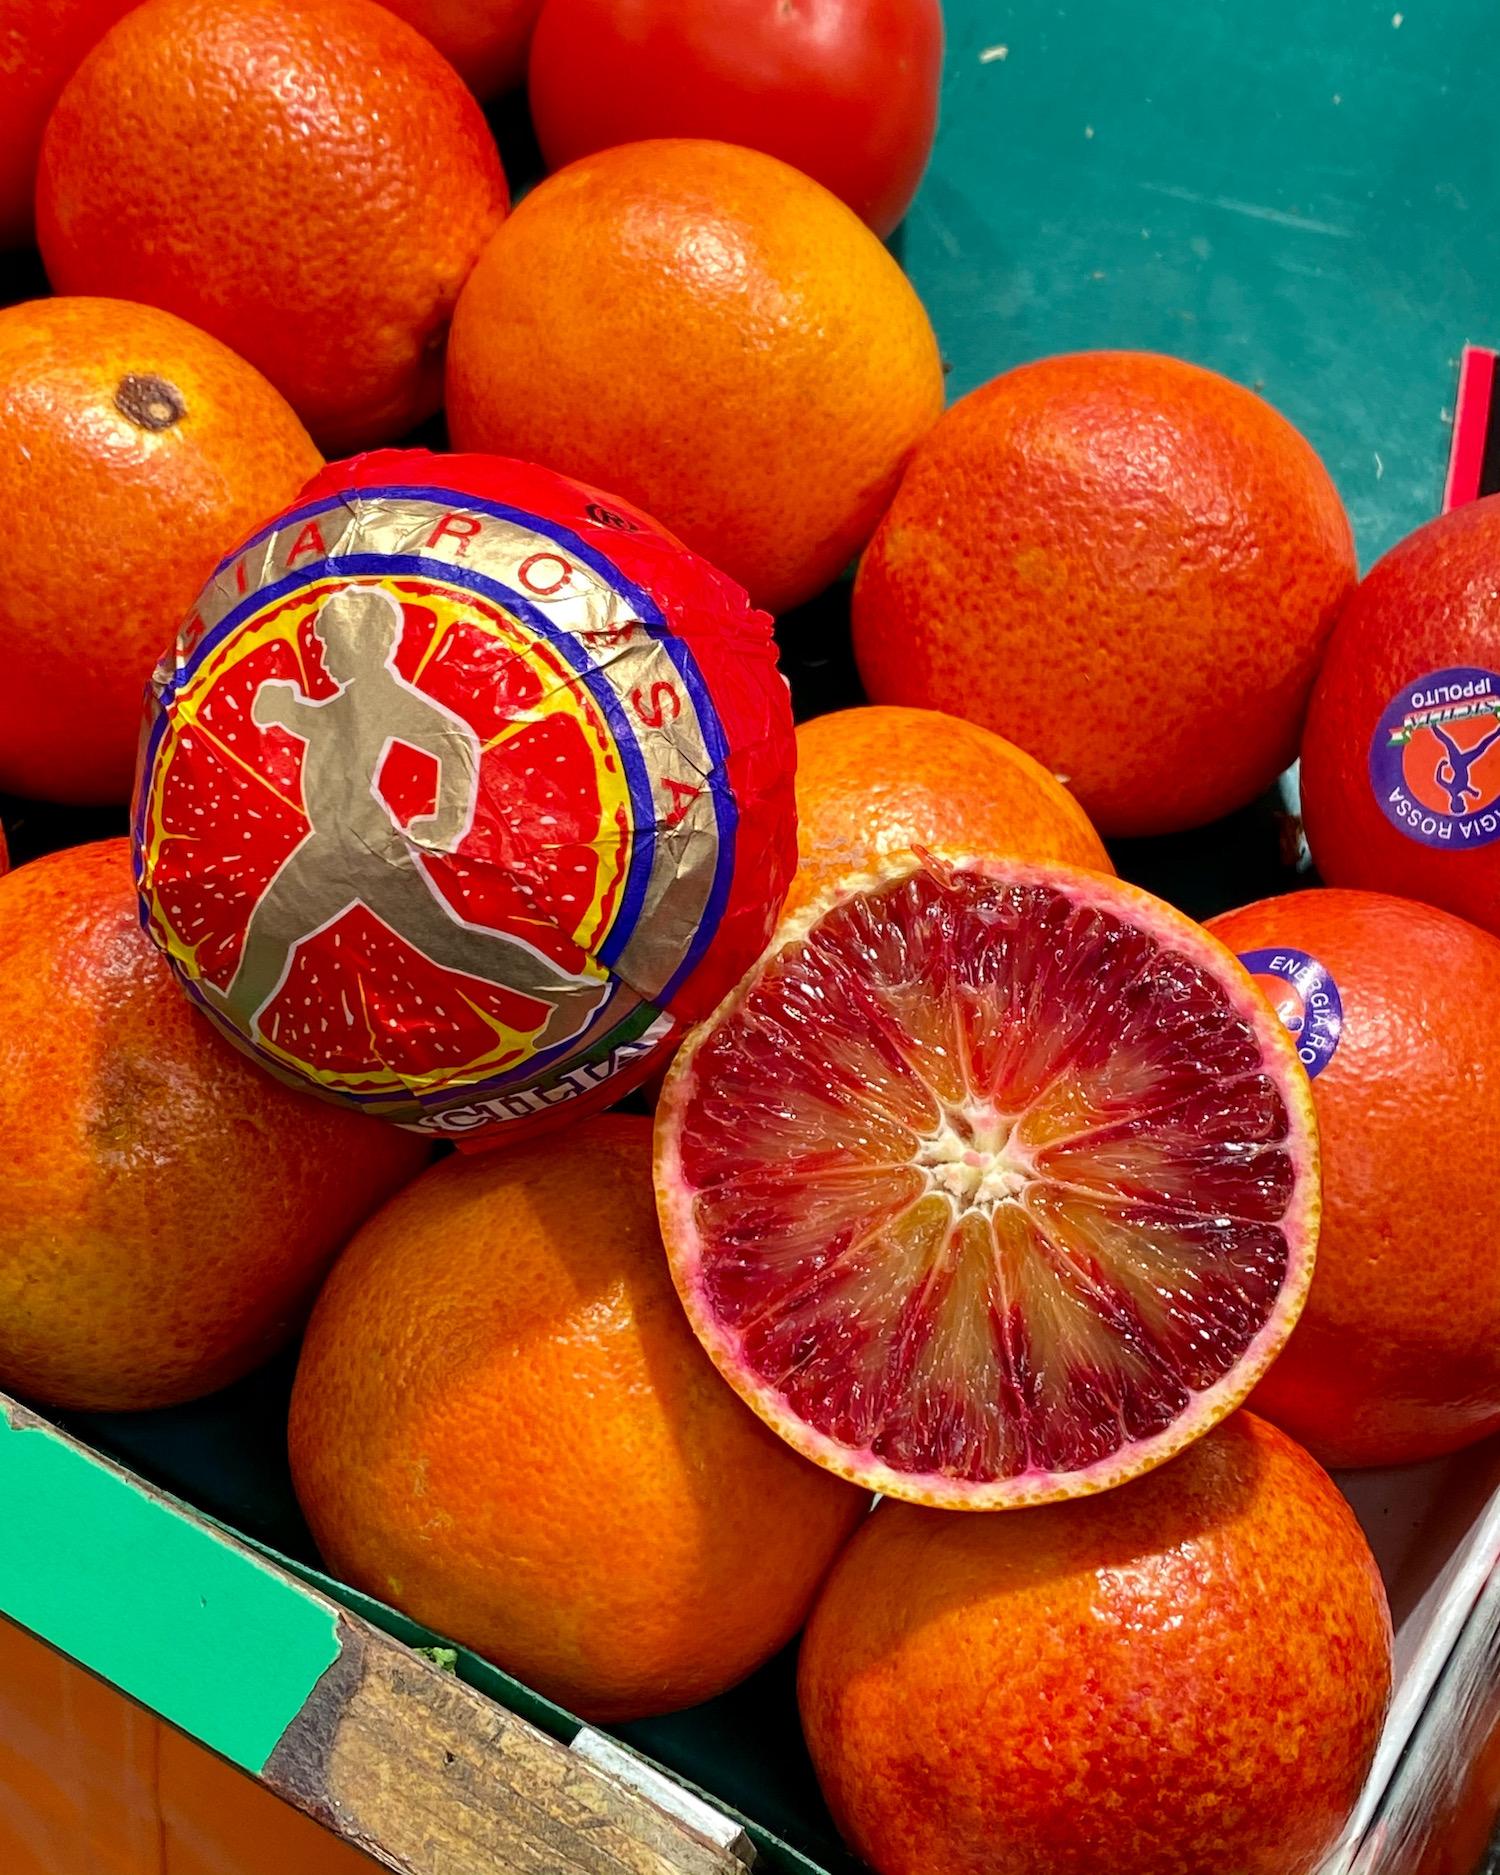 blood oranges at the montrouge market